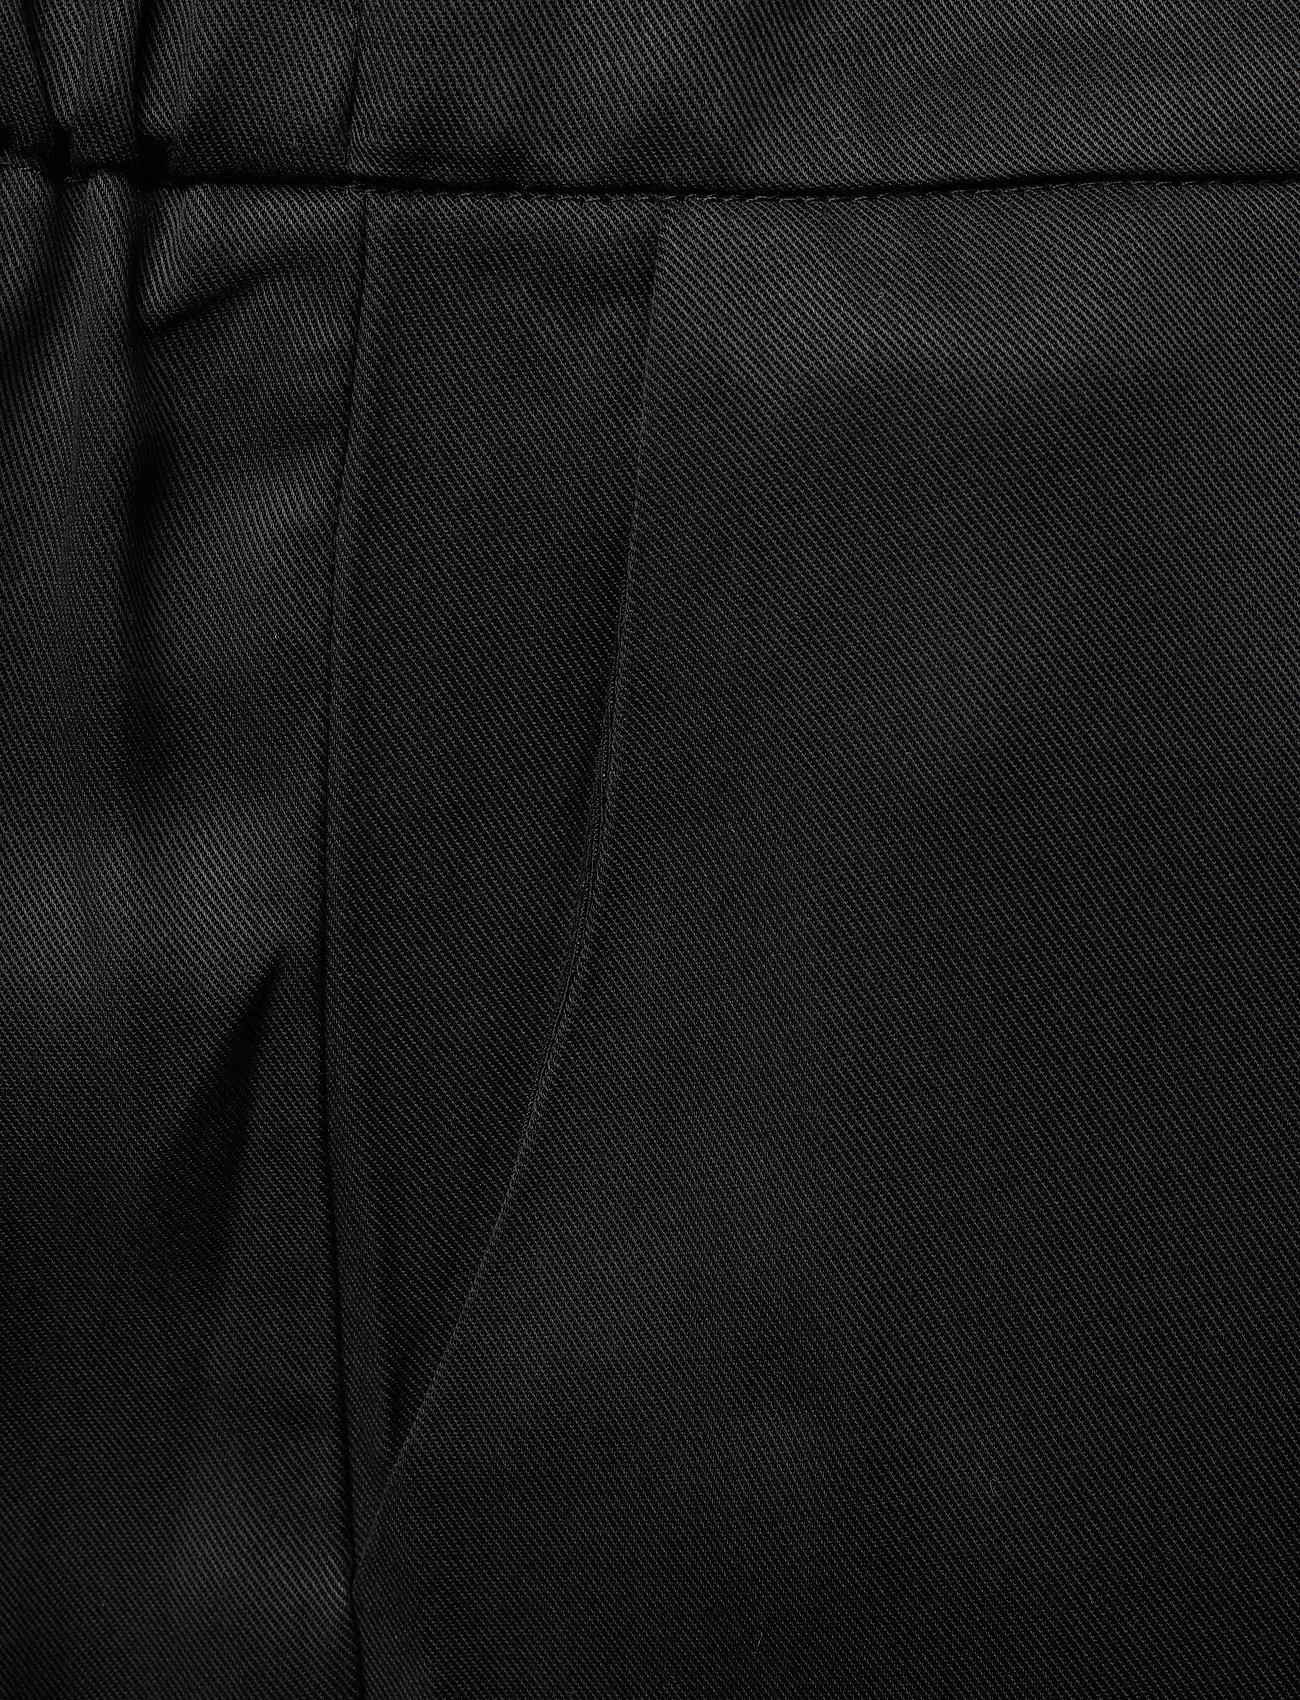 Nels Pant Stg (Black) (99 €) - IBEN R7BZH